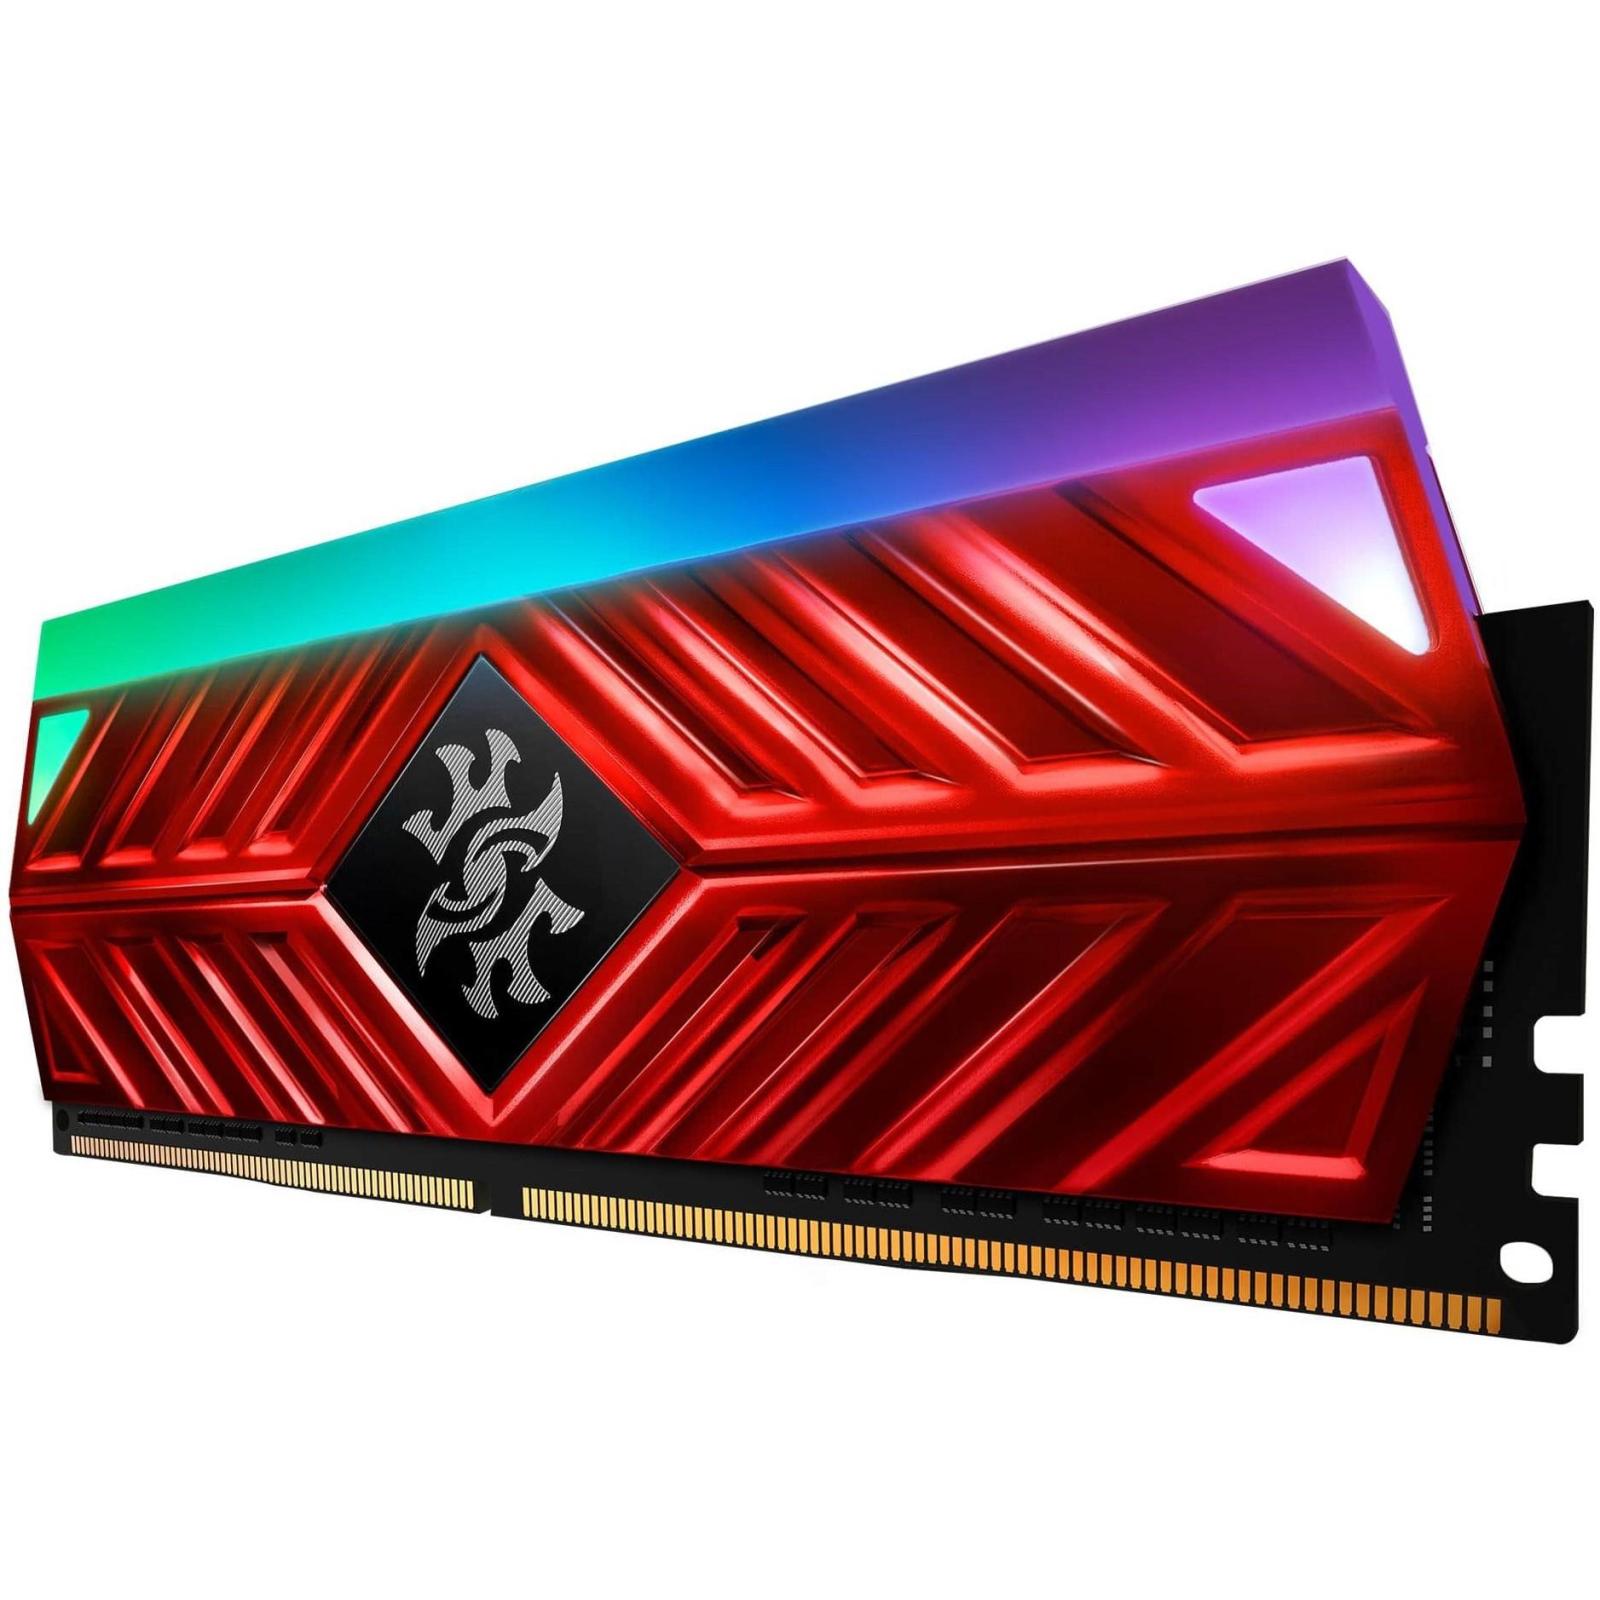 Модуль памяти для компьютера DDR4 8GB 3000 MHz XPG Spectrix D41 Red ADATA (AX4U300038G16-SR41) изображение 3